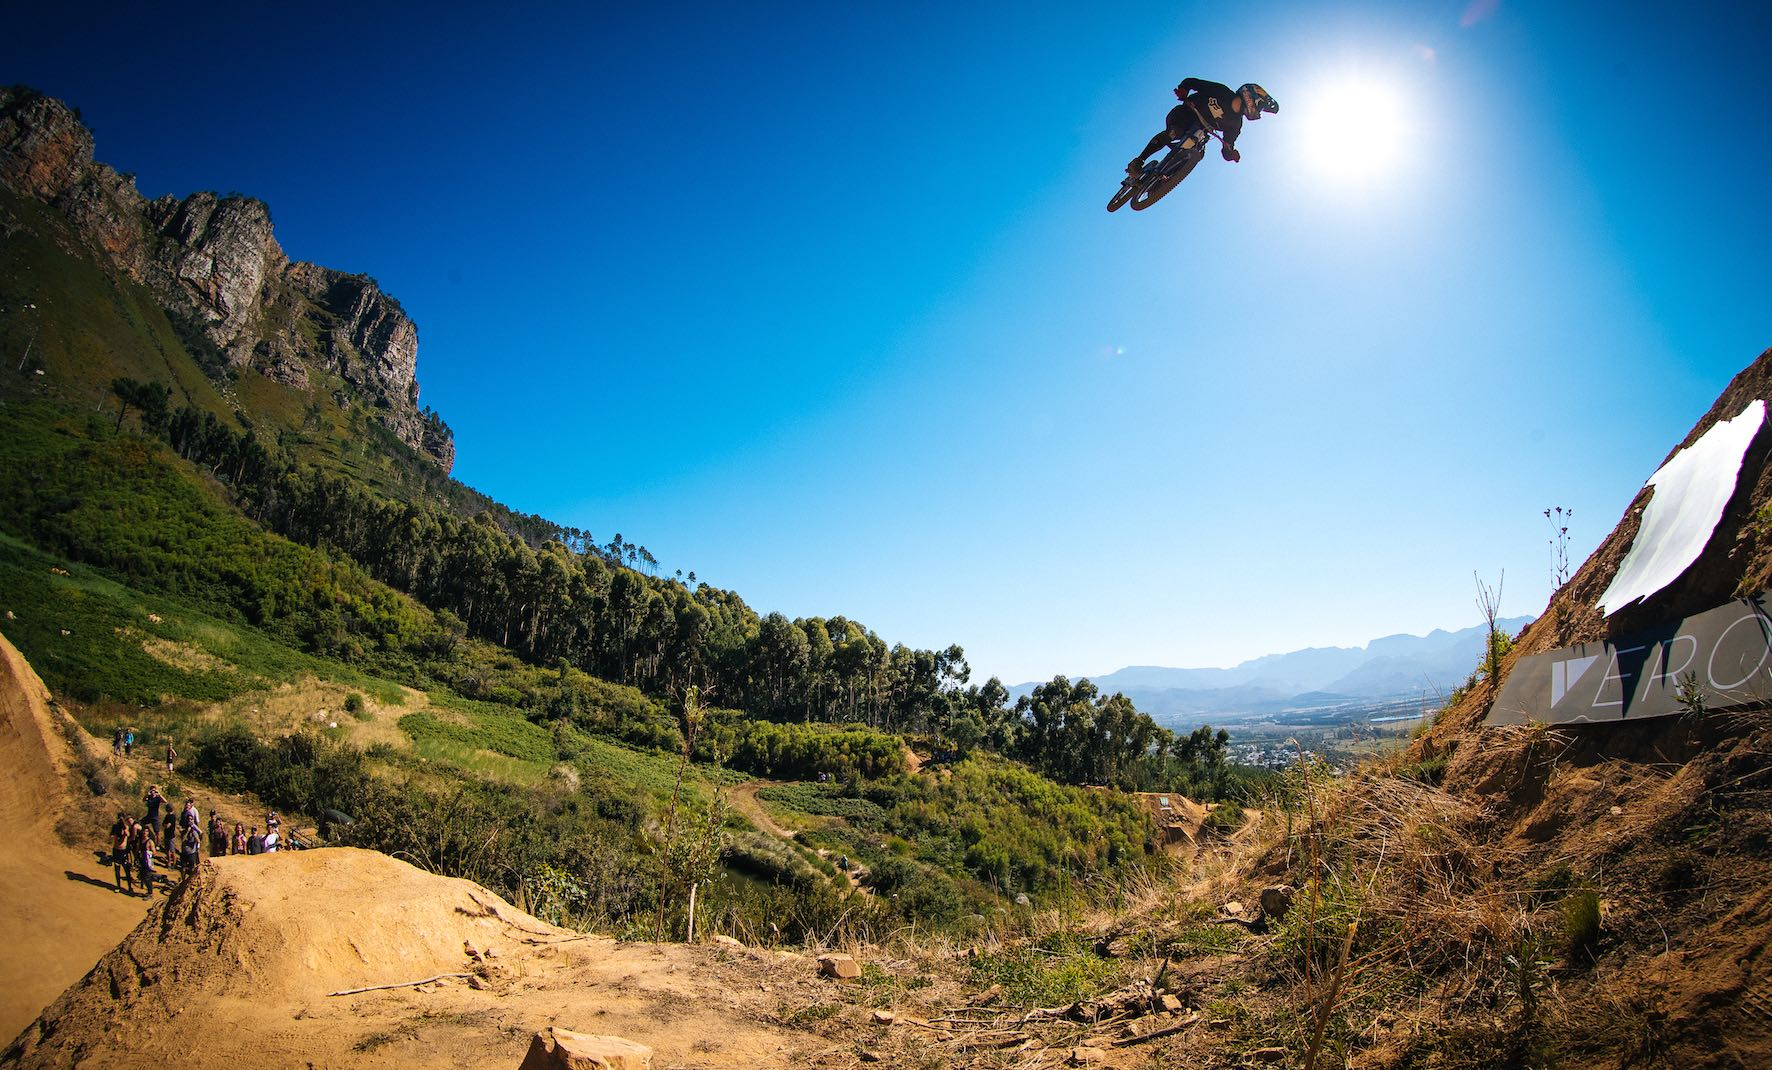 Andreu Lacondeguy riding the 2019 DarkFEST Freeride MTB course